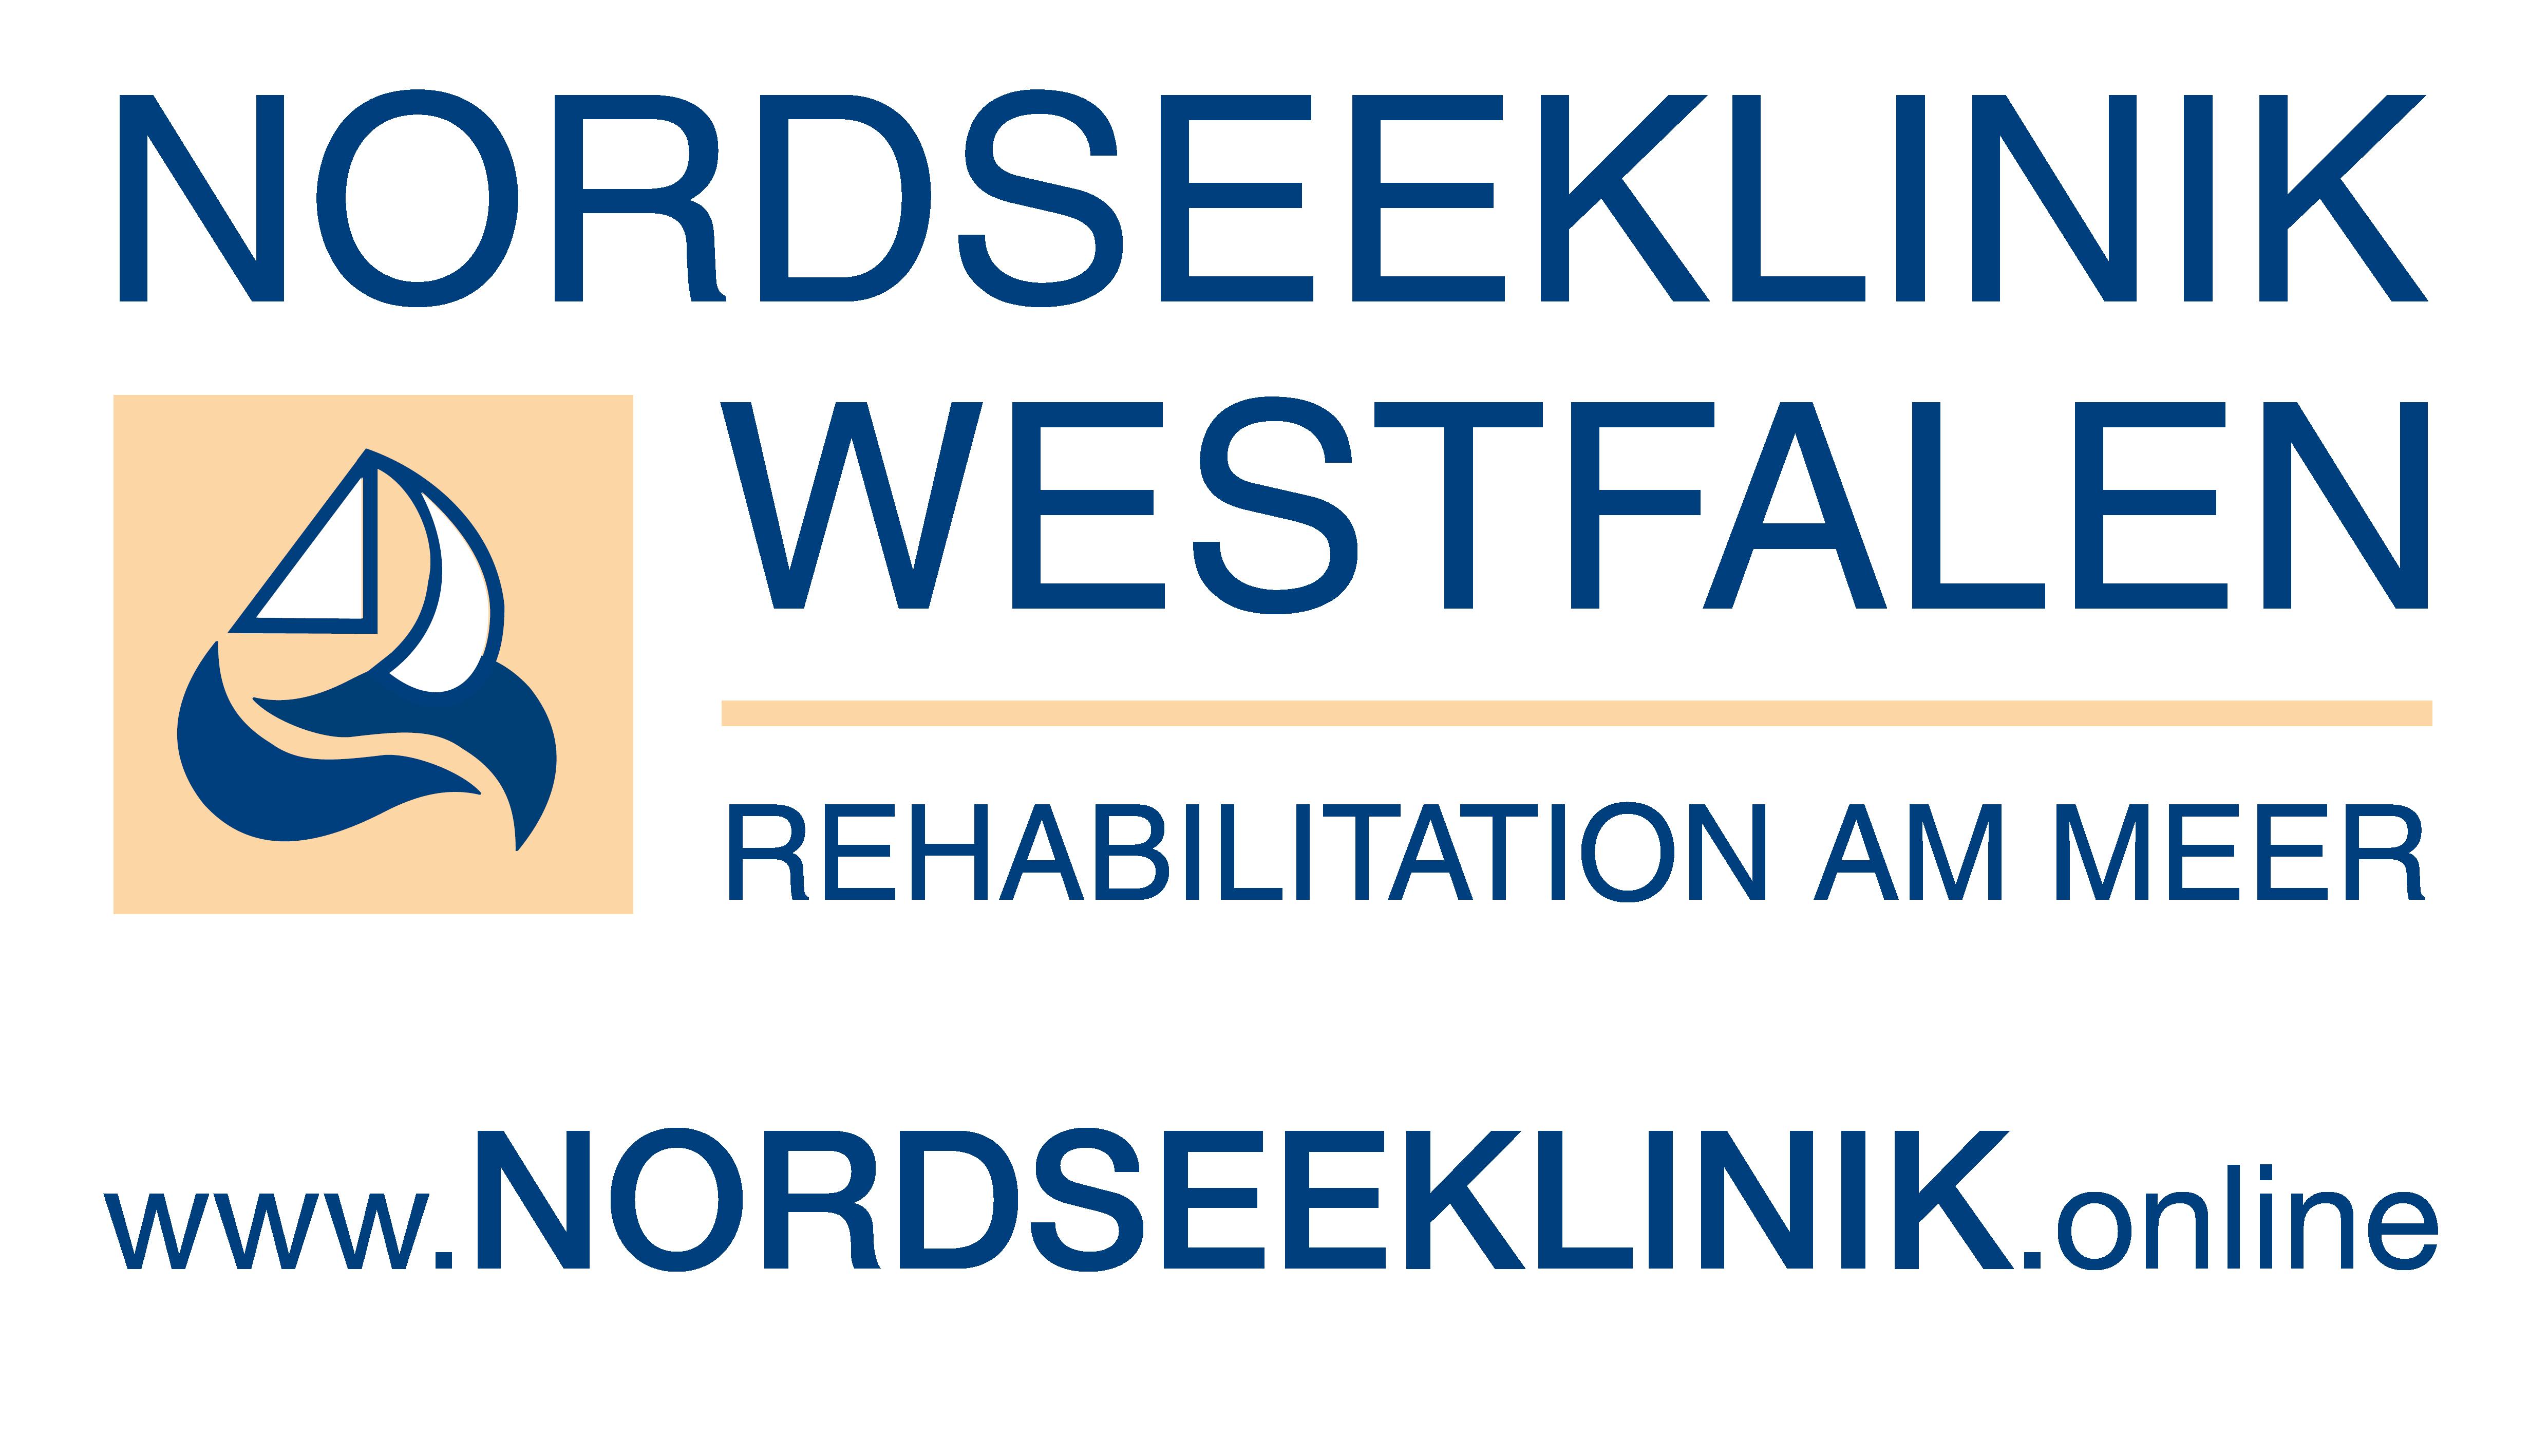 Nordseeklinik Westfalen - Rehabilitation am Meer